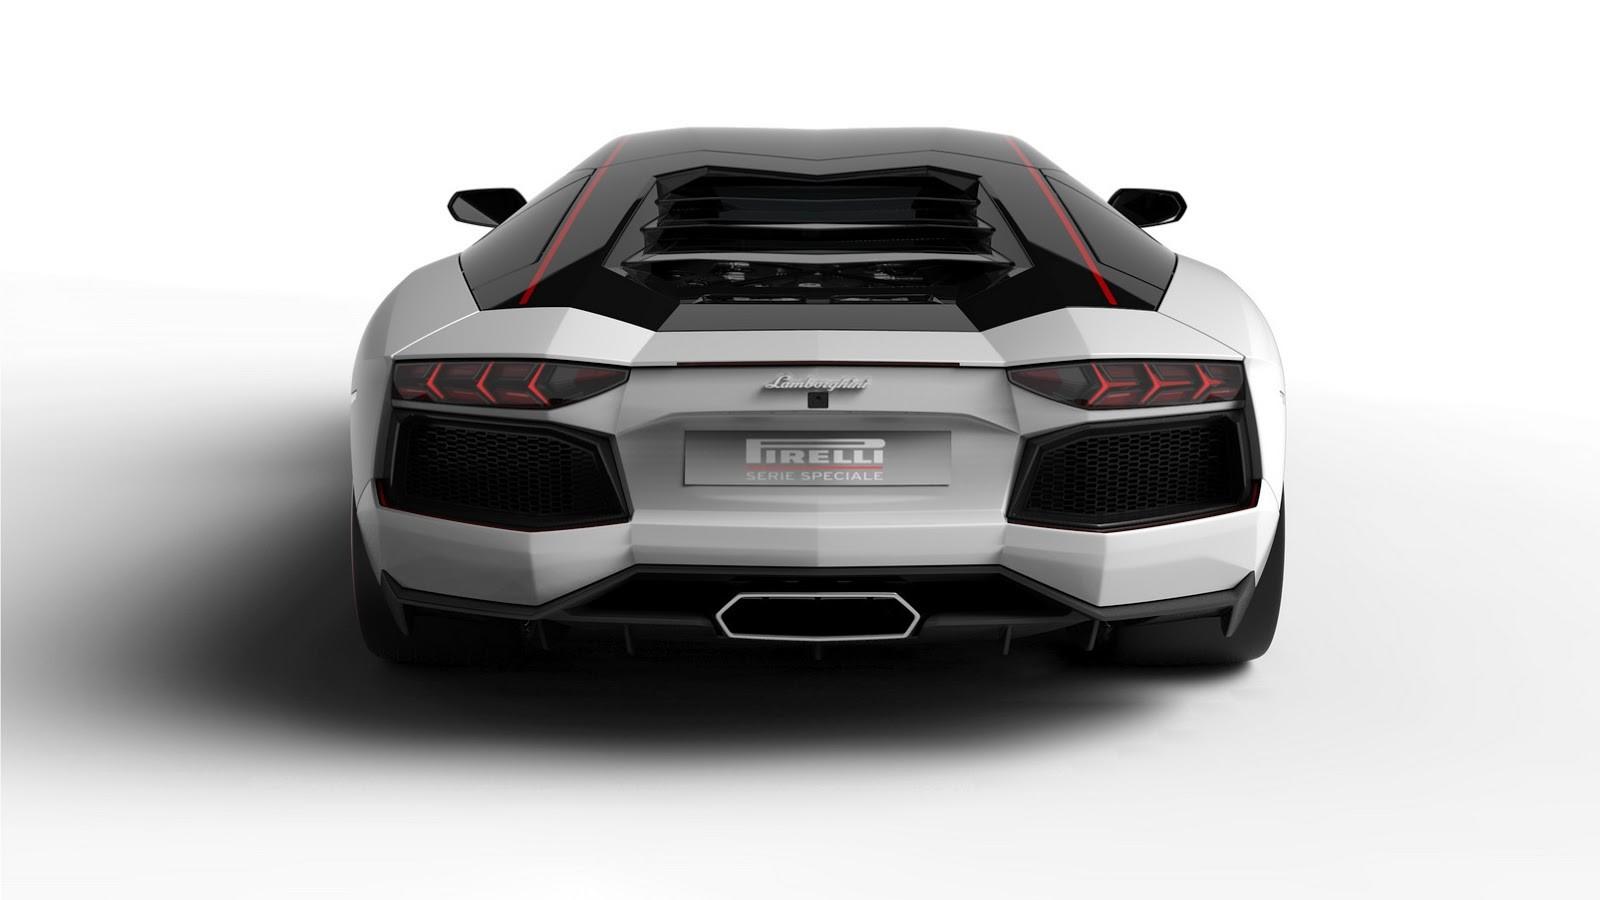 Aventador LP 700-4 Pirelli Edition